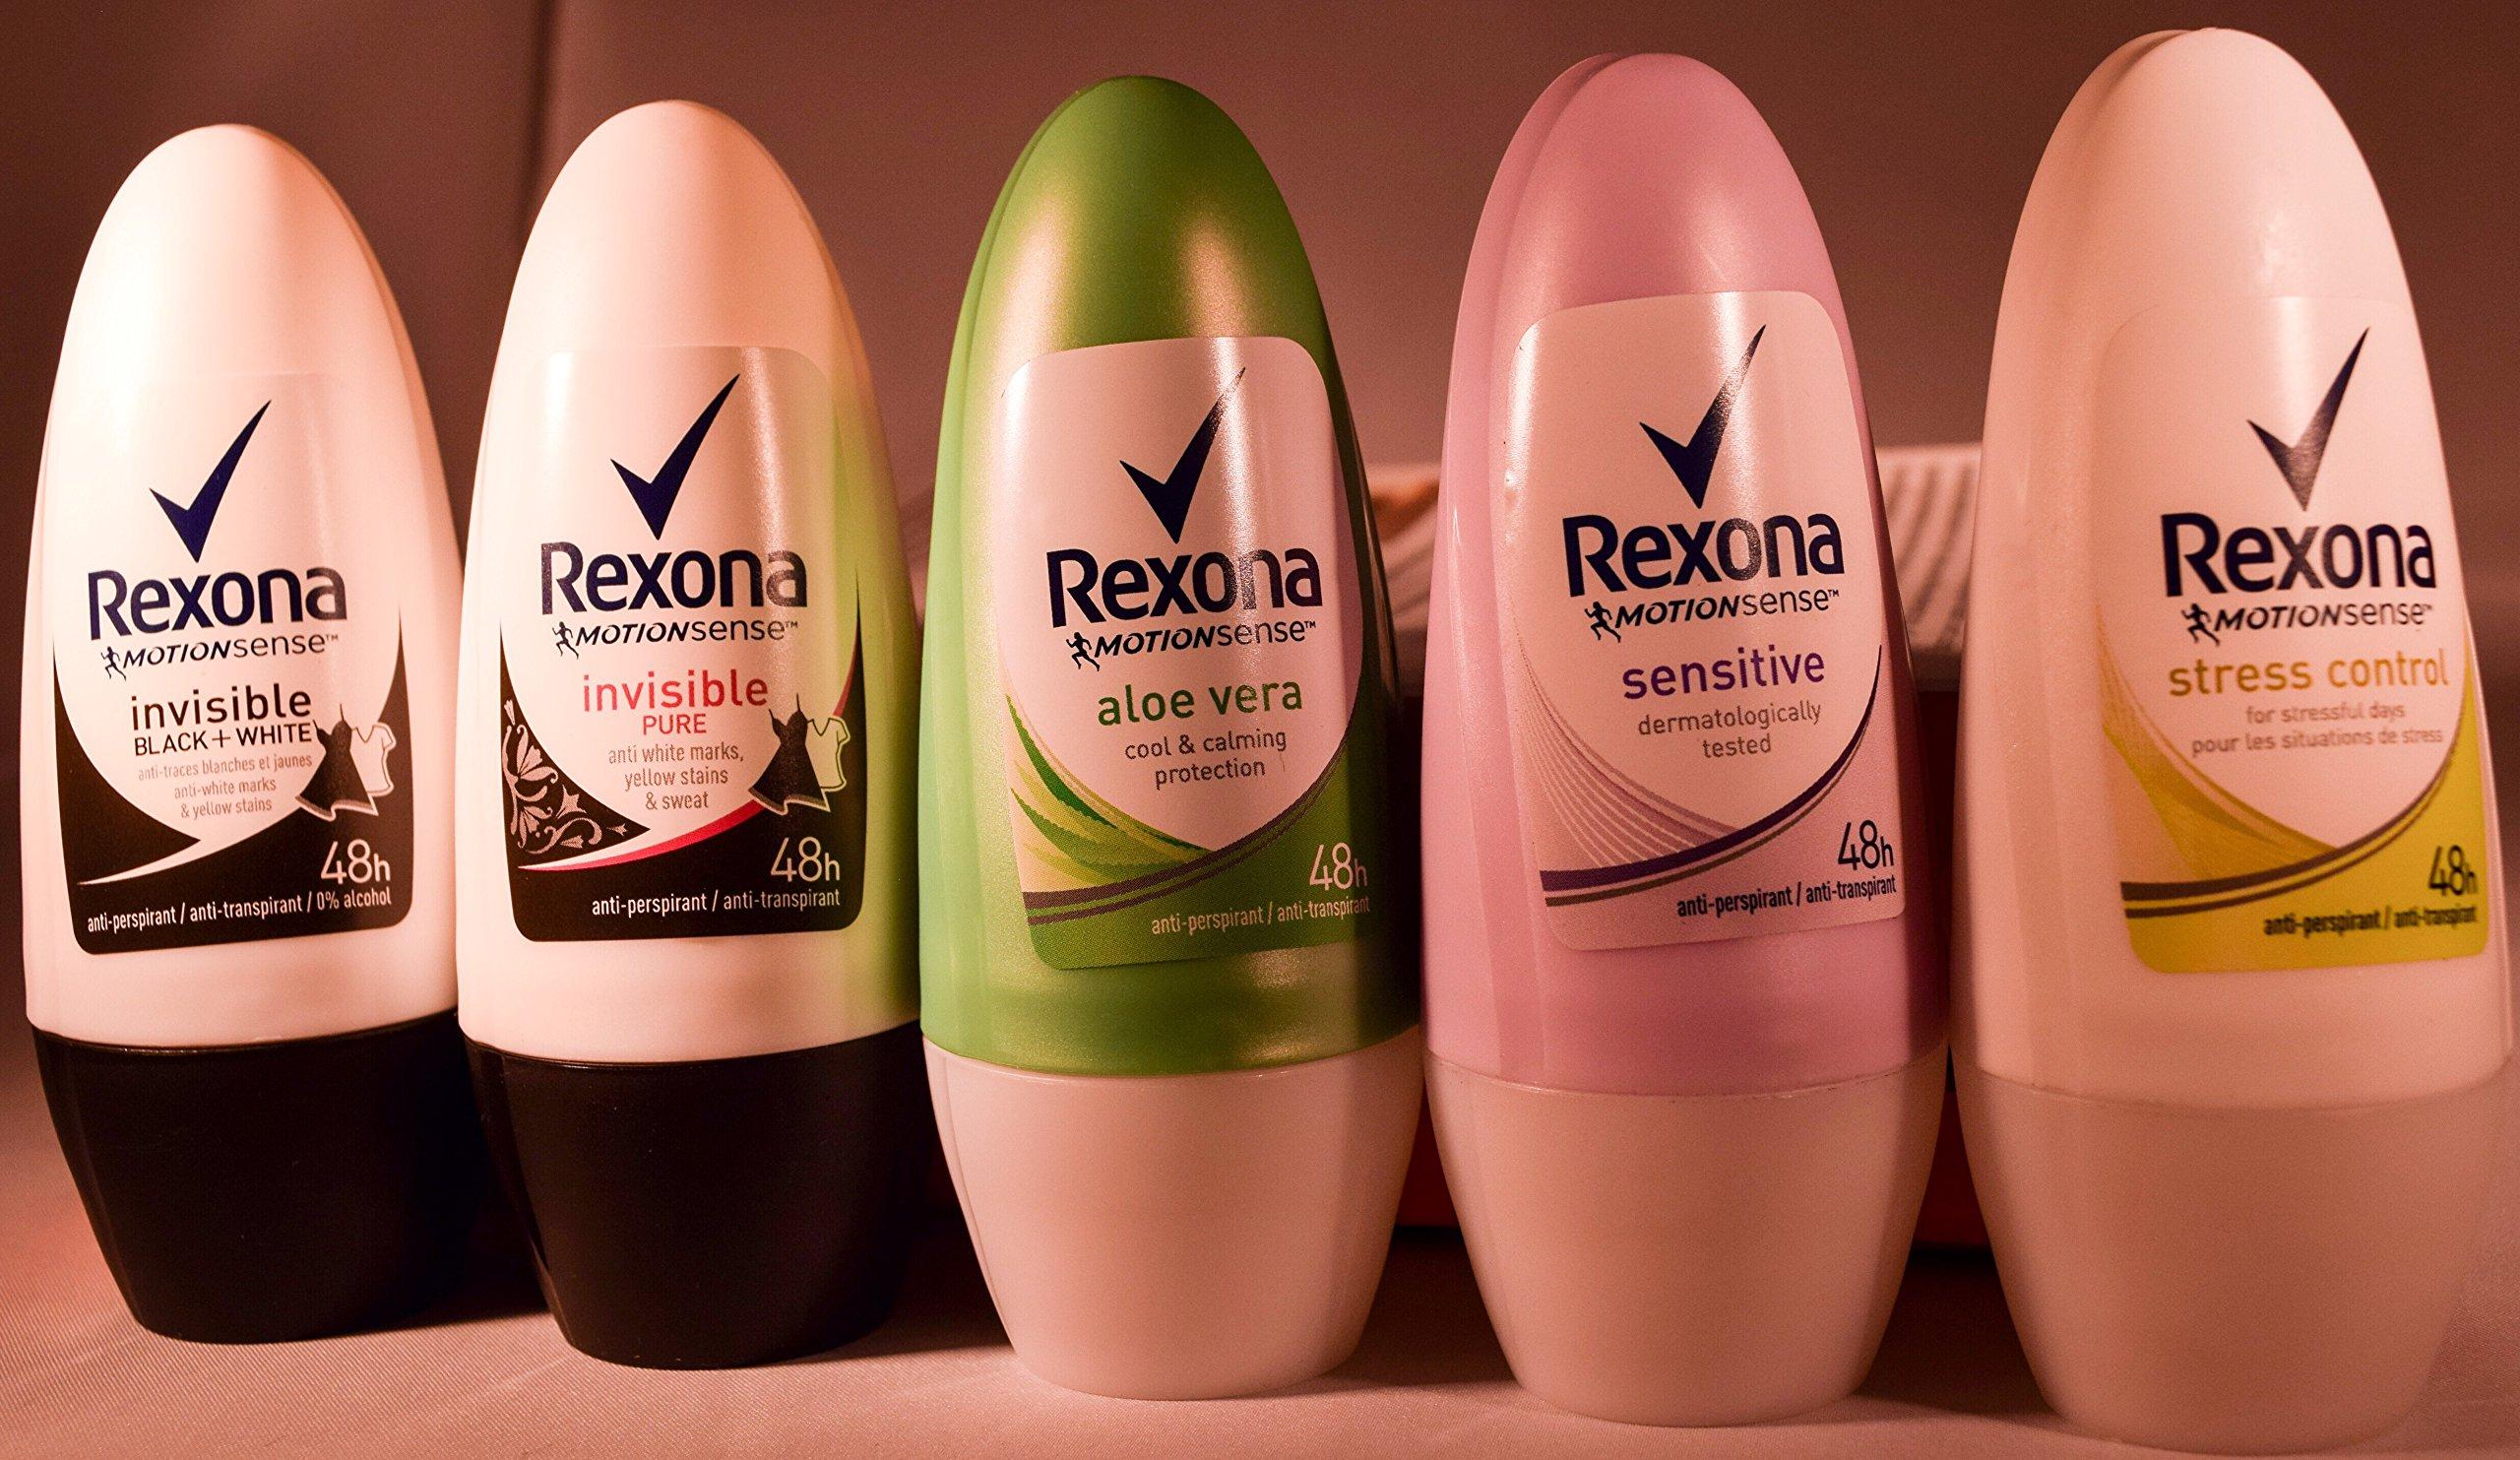 Rexona Women Cotton 48h Anti Perspirant Deodorant Roll On Men Woman Body For Anit Transpirant